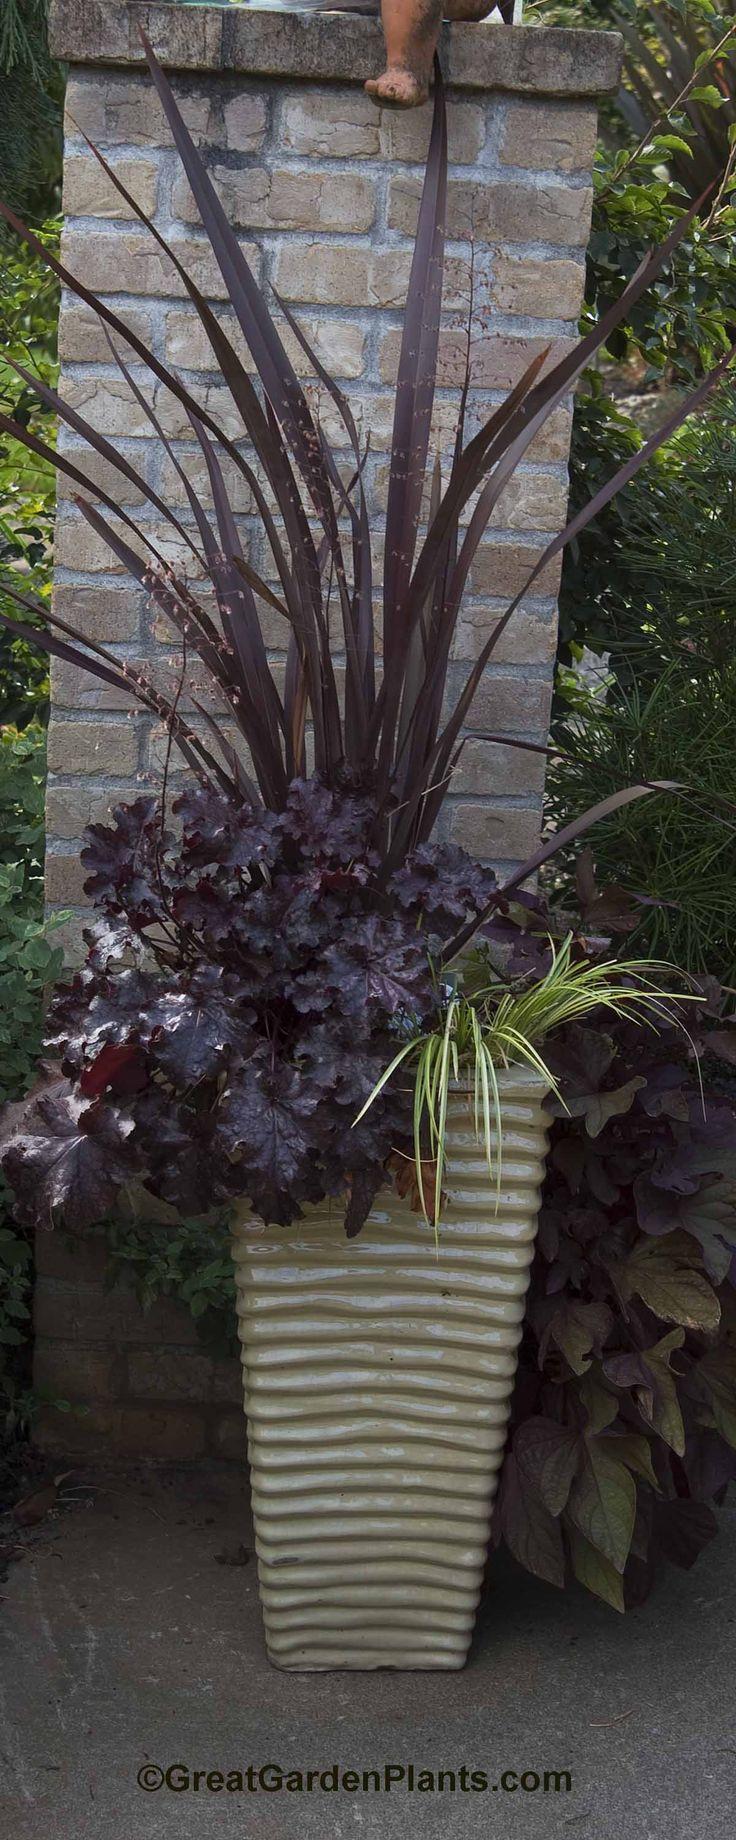 Container Gardening with Phormium & Heuchera